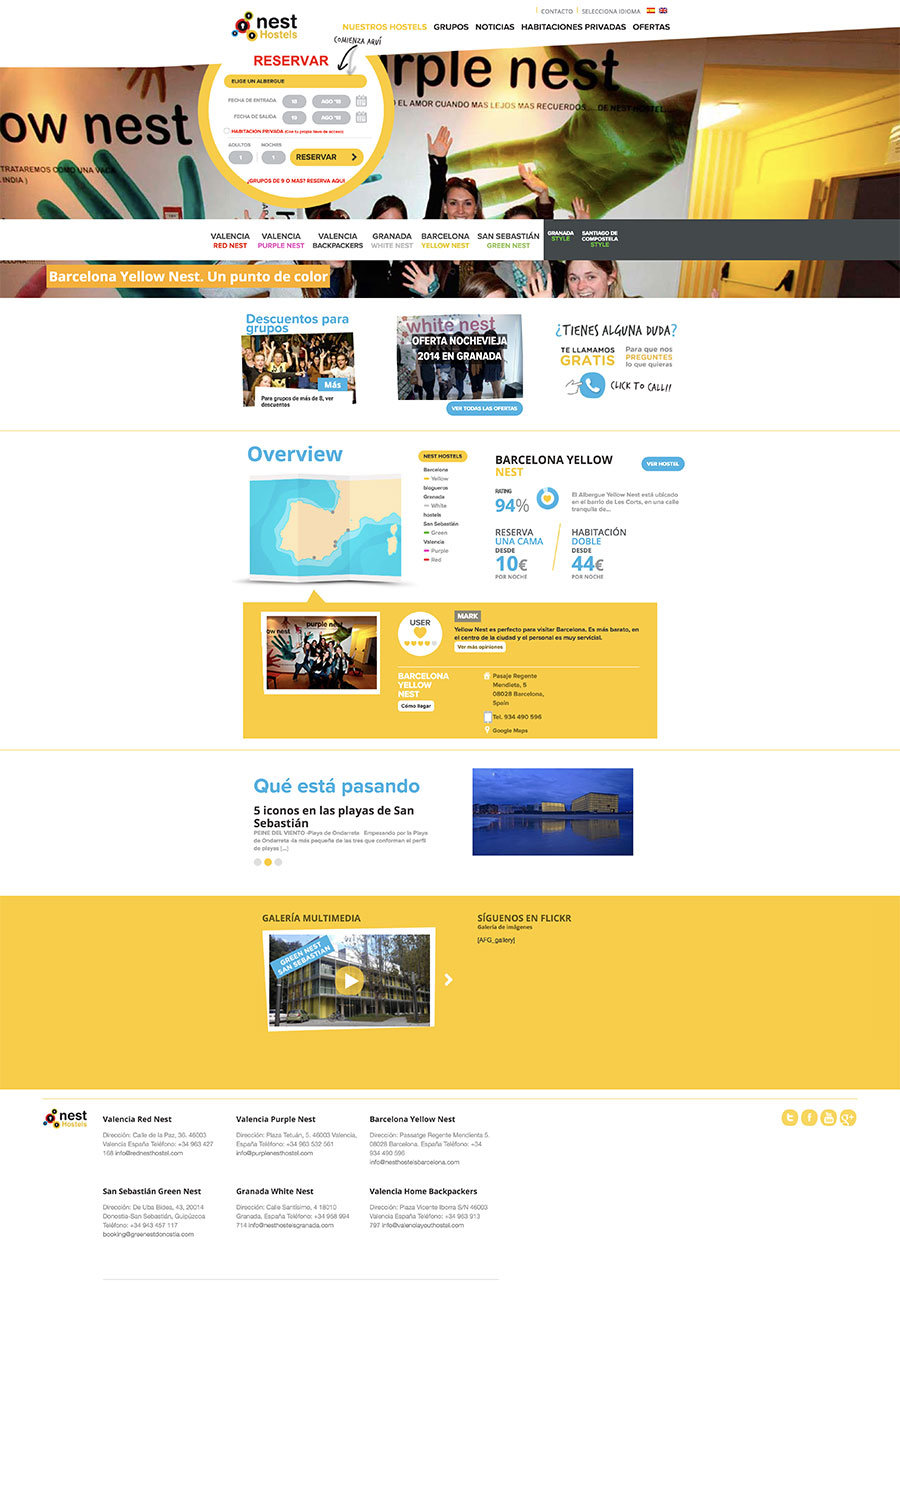 Wellaggio-diseño-web-valencia-nest-hostels-es-2018-08-16-16_52_32